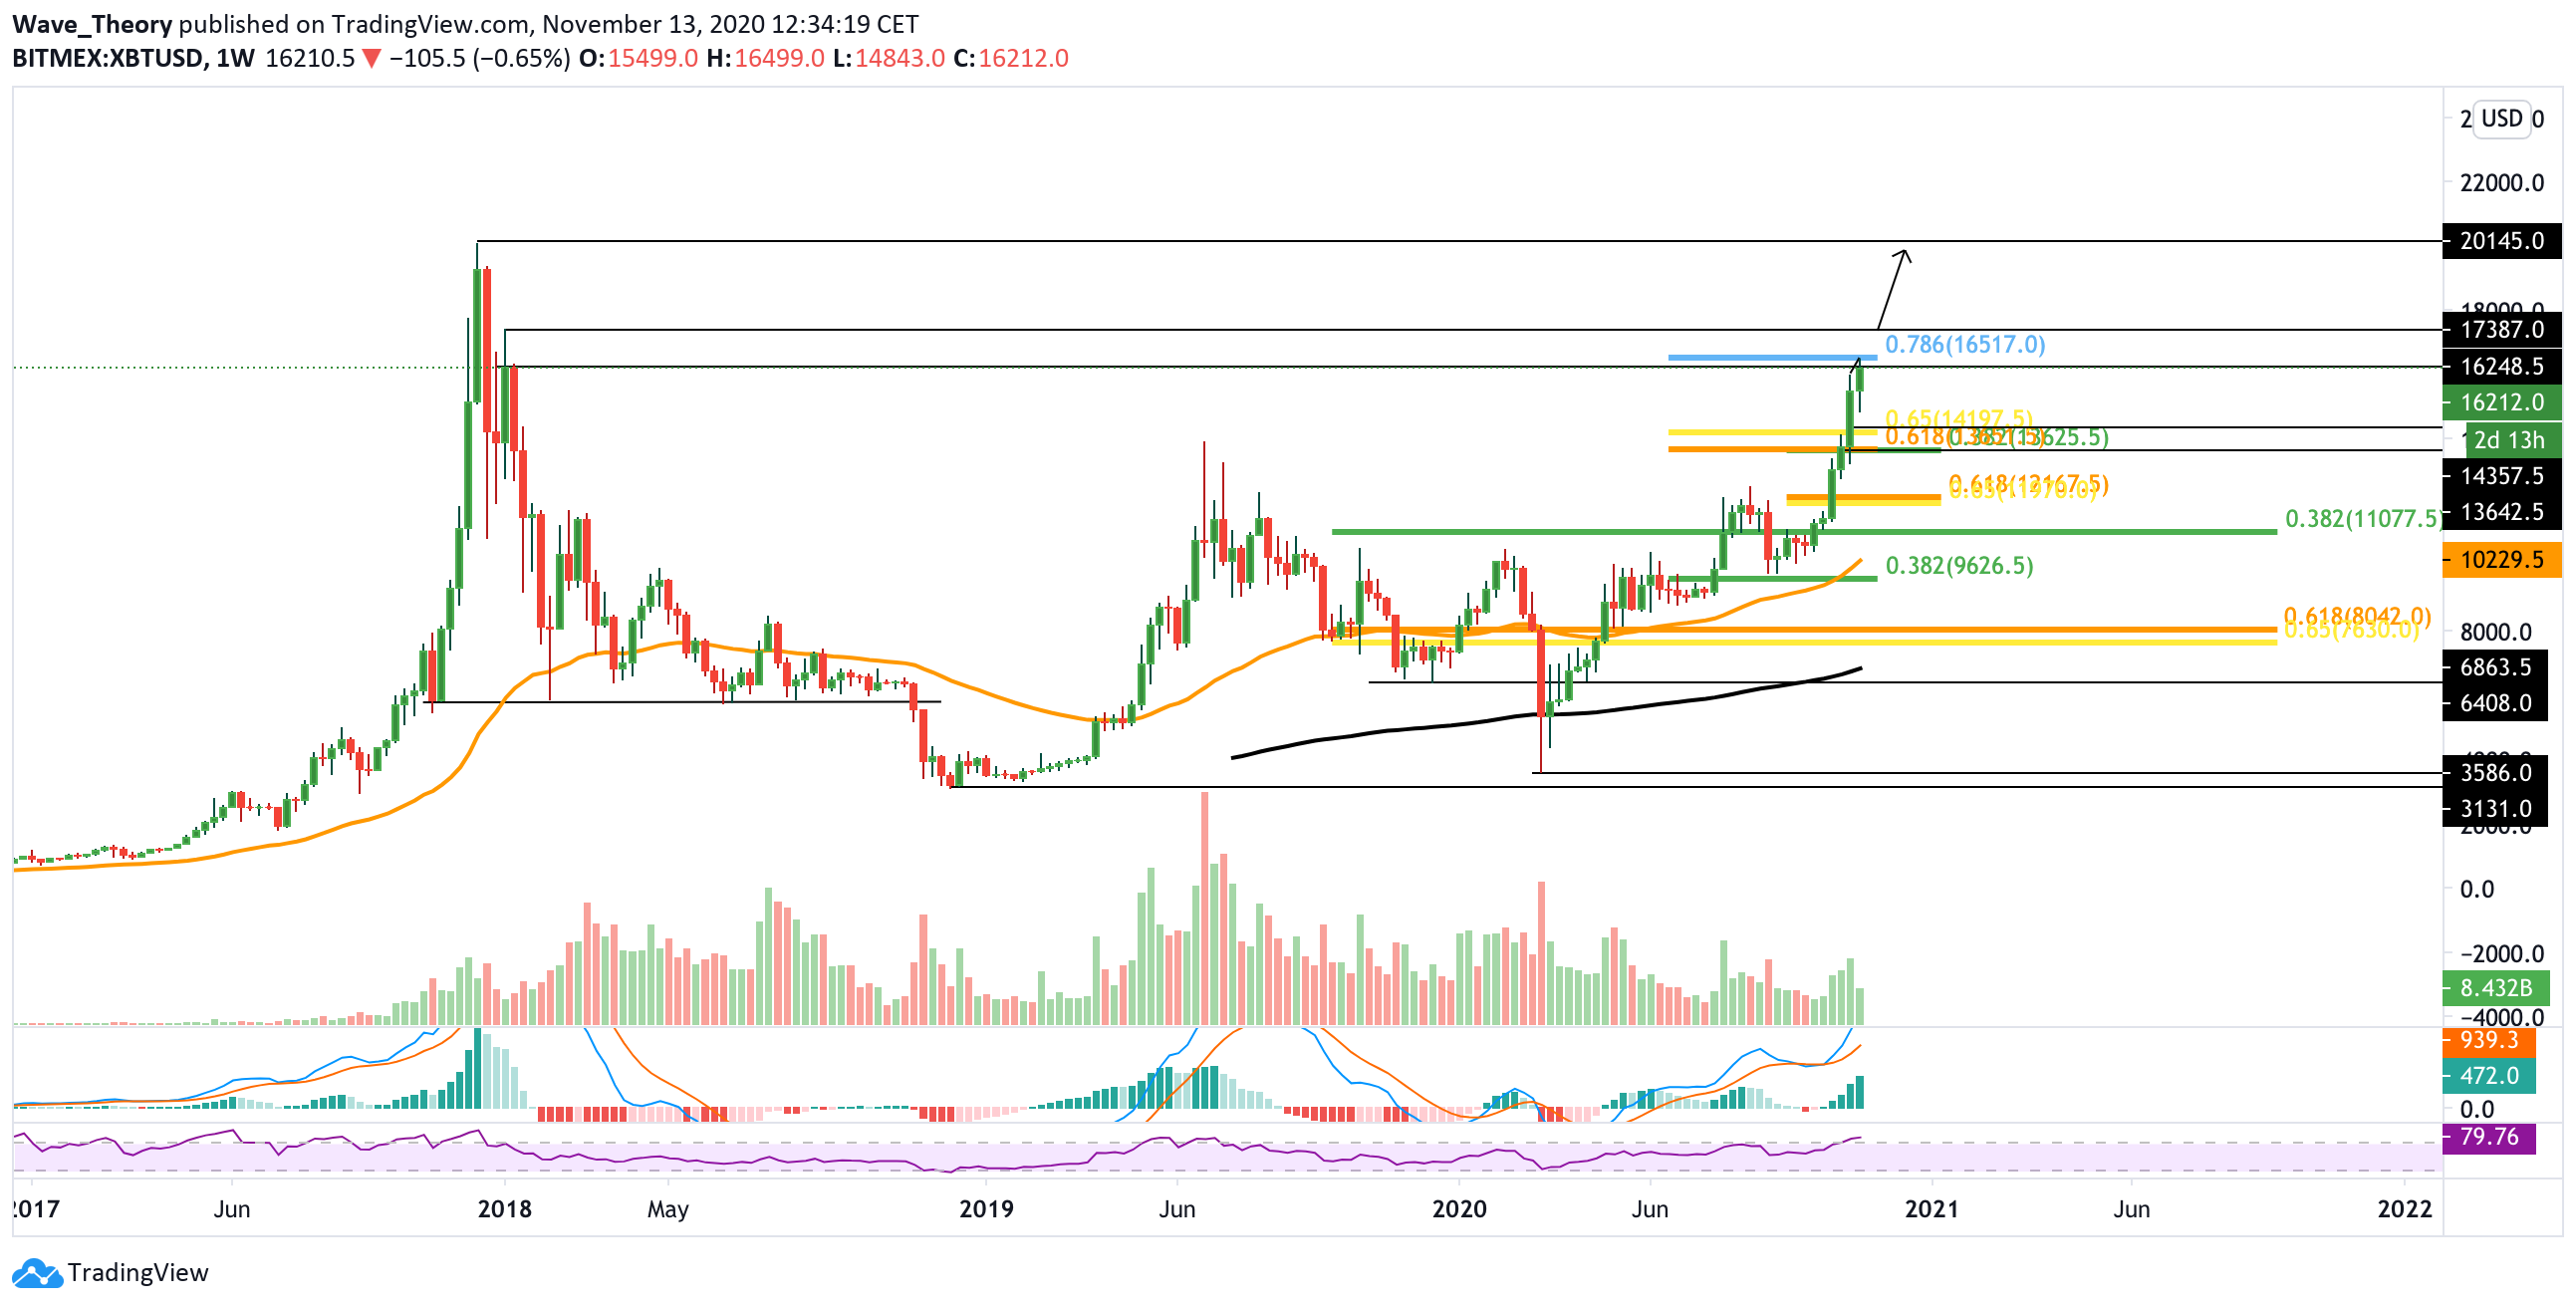 Bitcoin Kurs Prognose von Tradingview